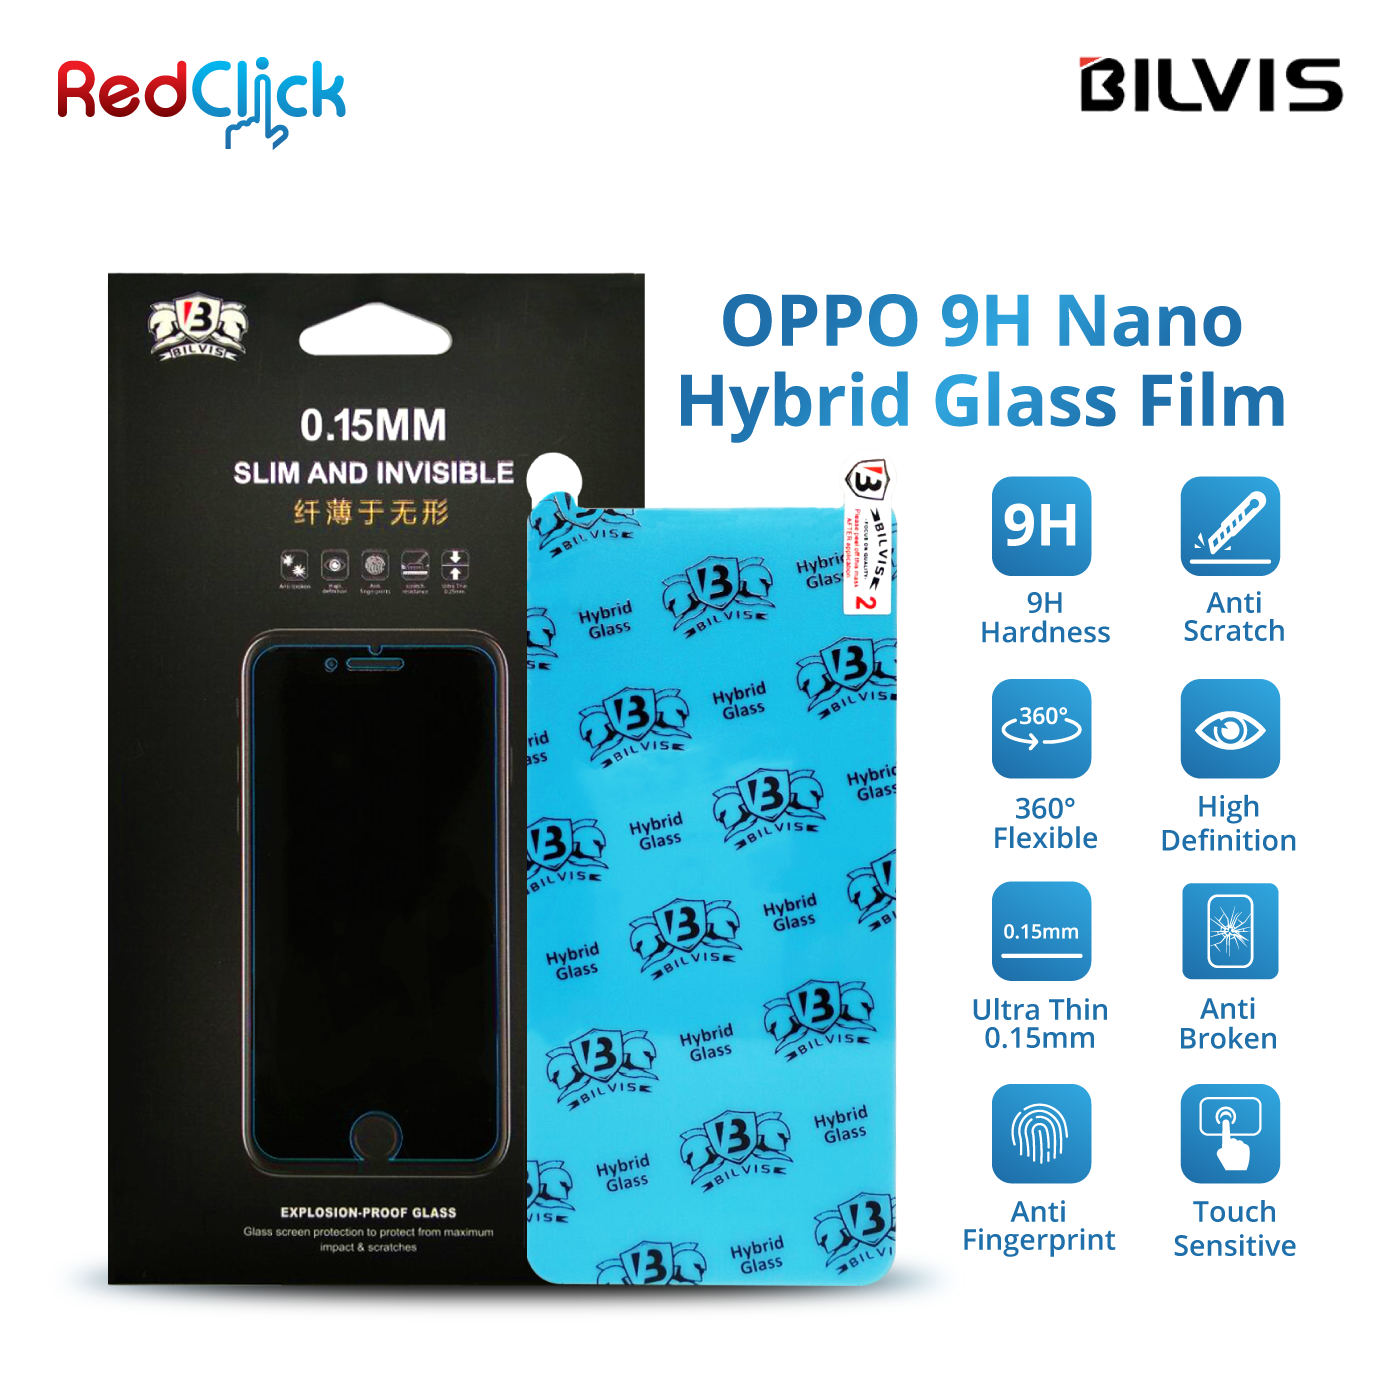 bilvis-oppo-9h-nano-hybrid-glass-film